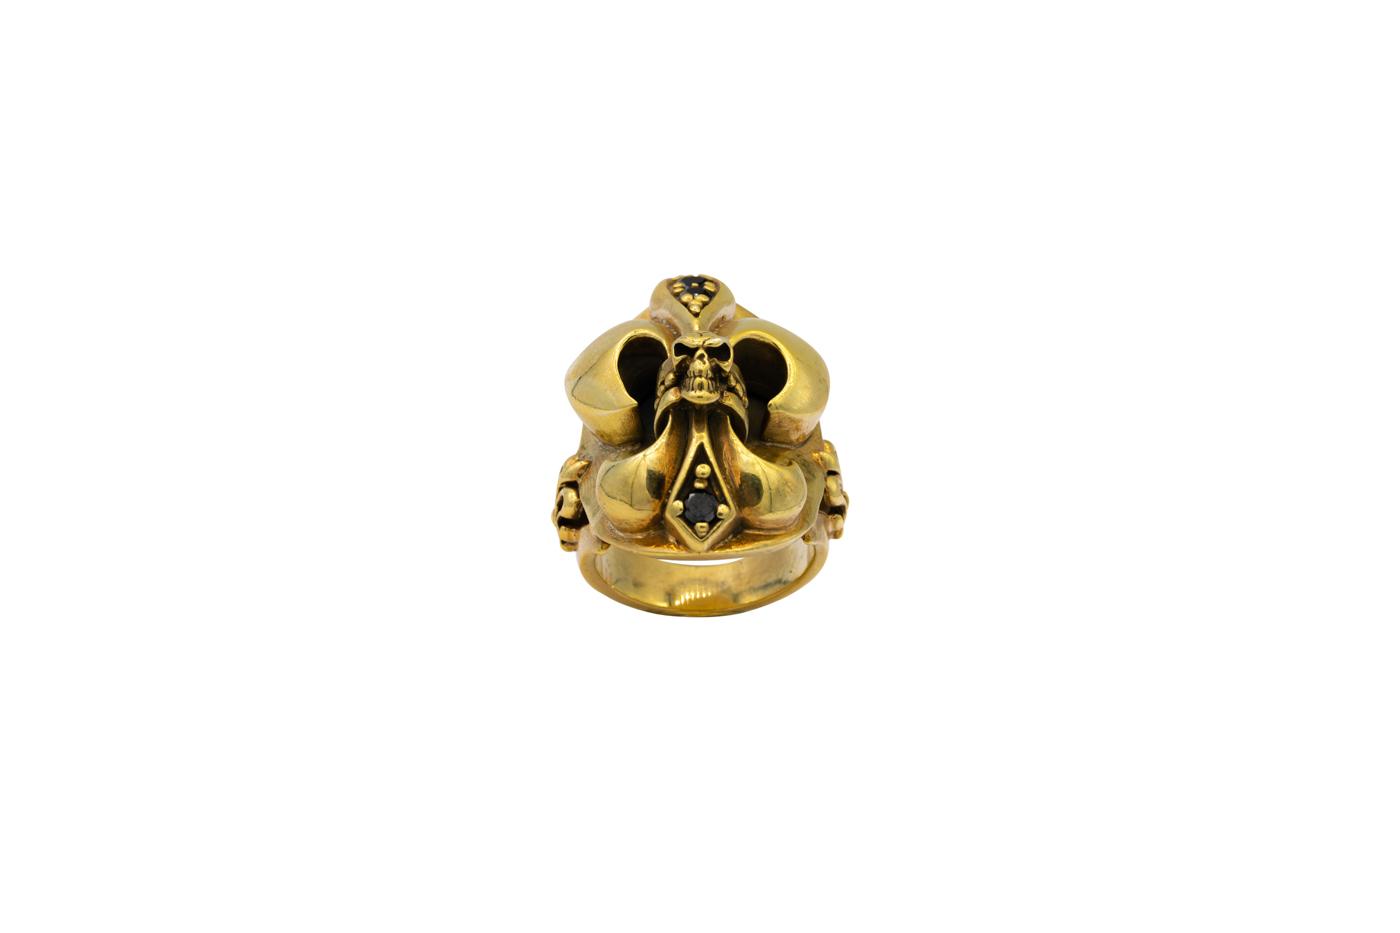 Harley-Davidson Golden Skull Ring